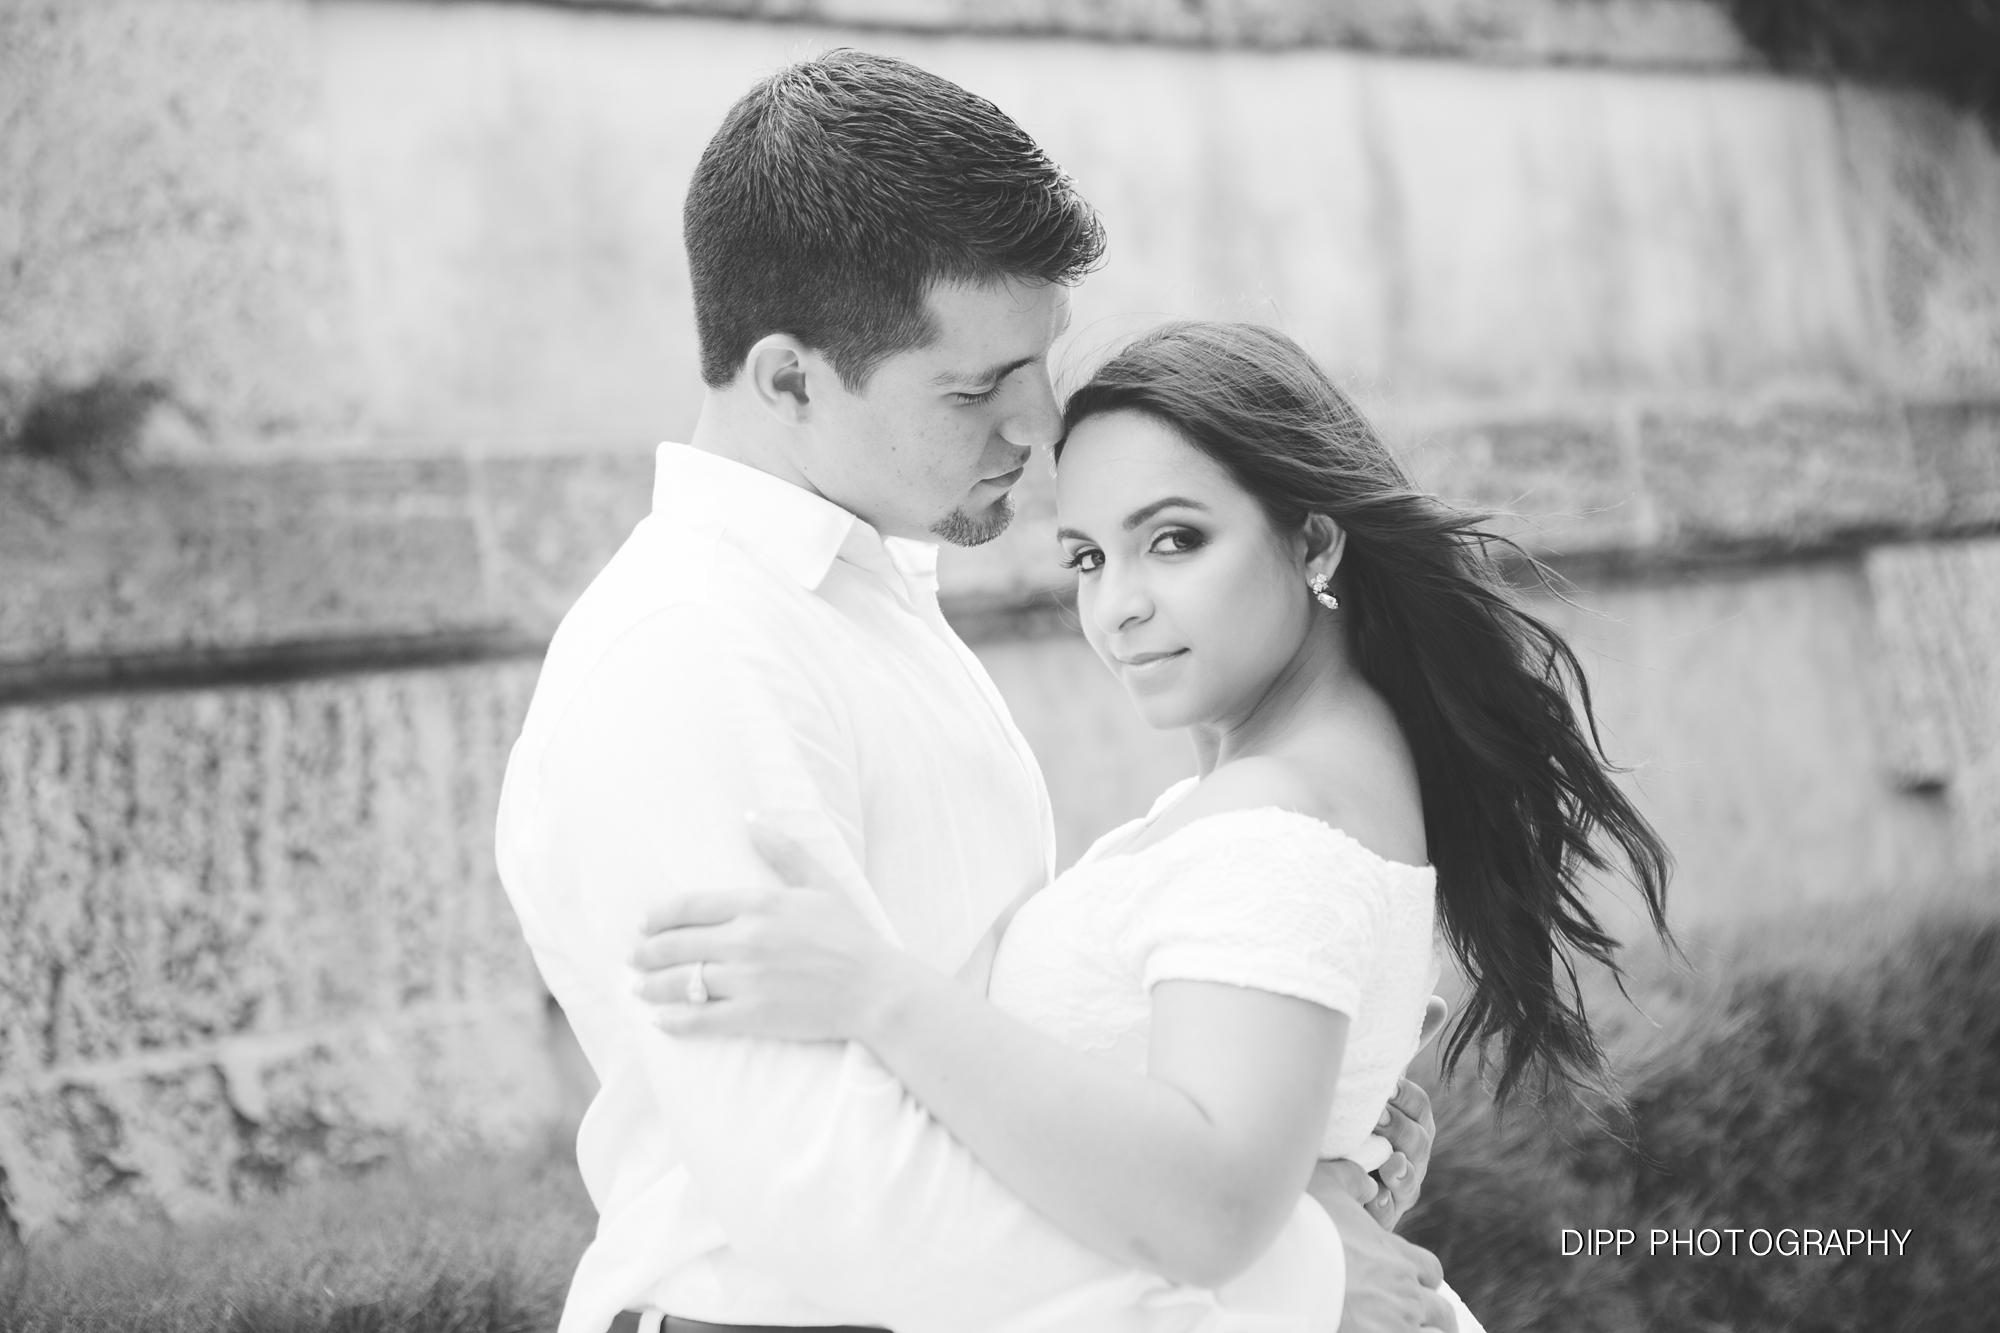 Dipp_2016 Alena & Alfredo ENGAGEMENT-474